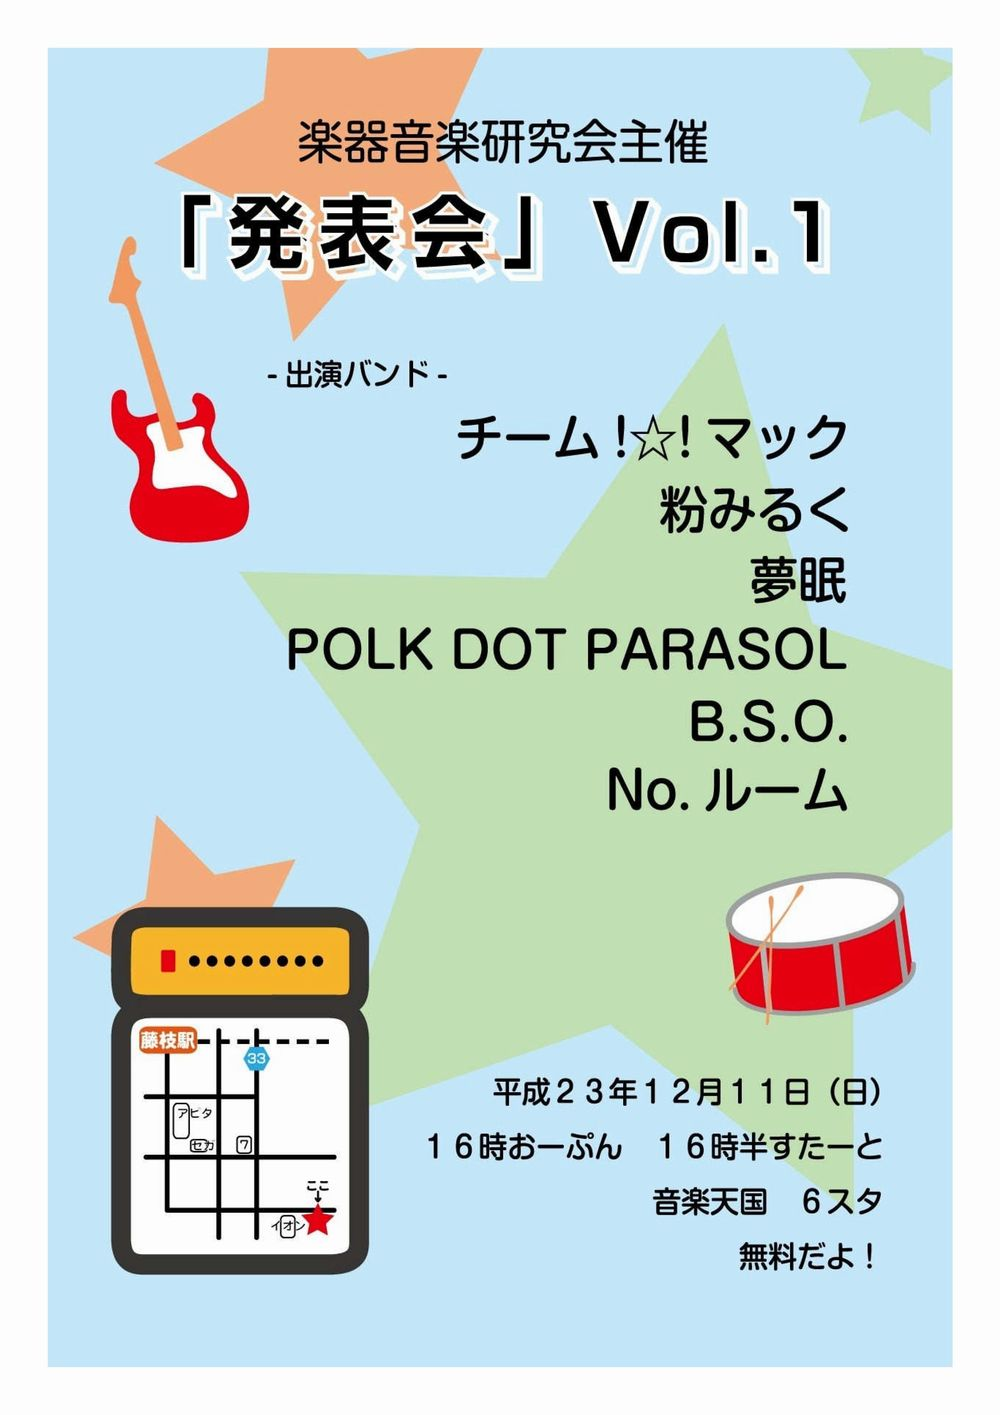 スタジオライブ「楽器音楽研究会・発表会Vol.1」@藤枝店12月11日(日)開催!